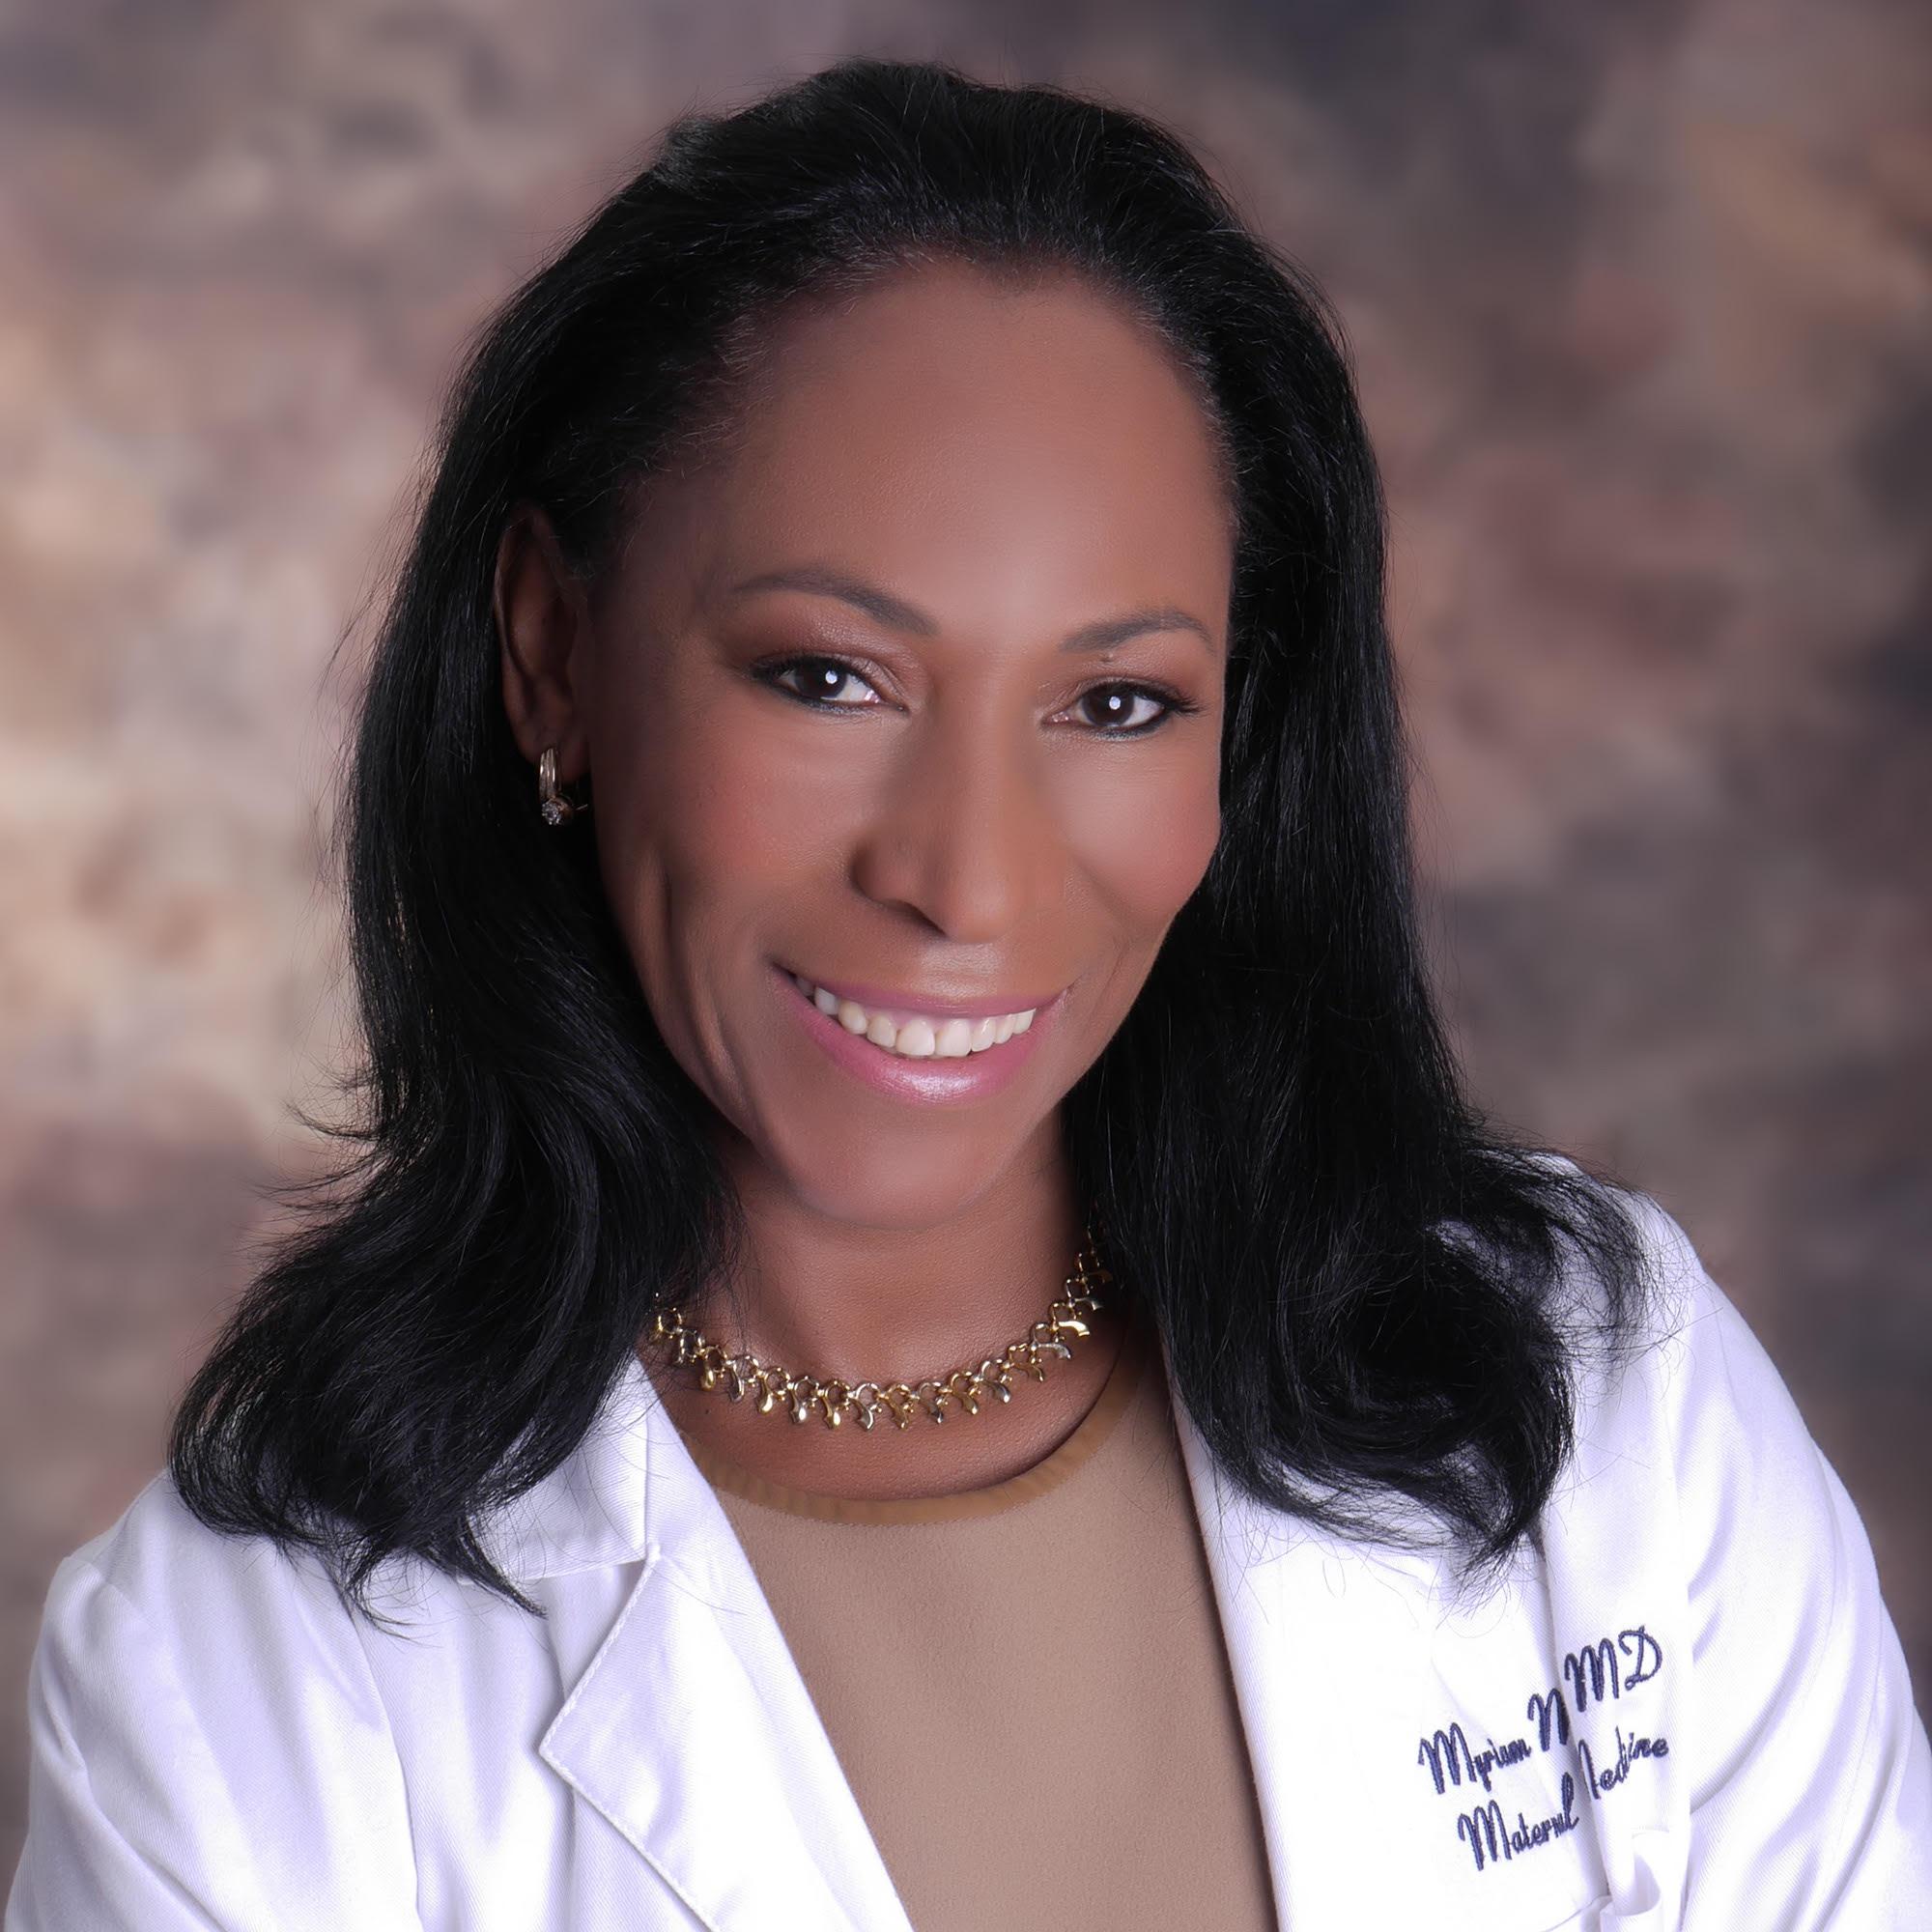 dr-myriam-mondestin-sorrentino